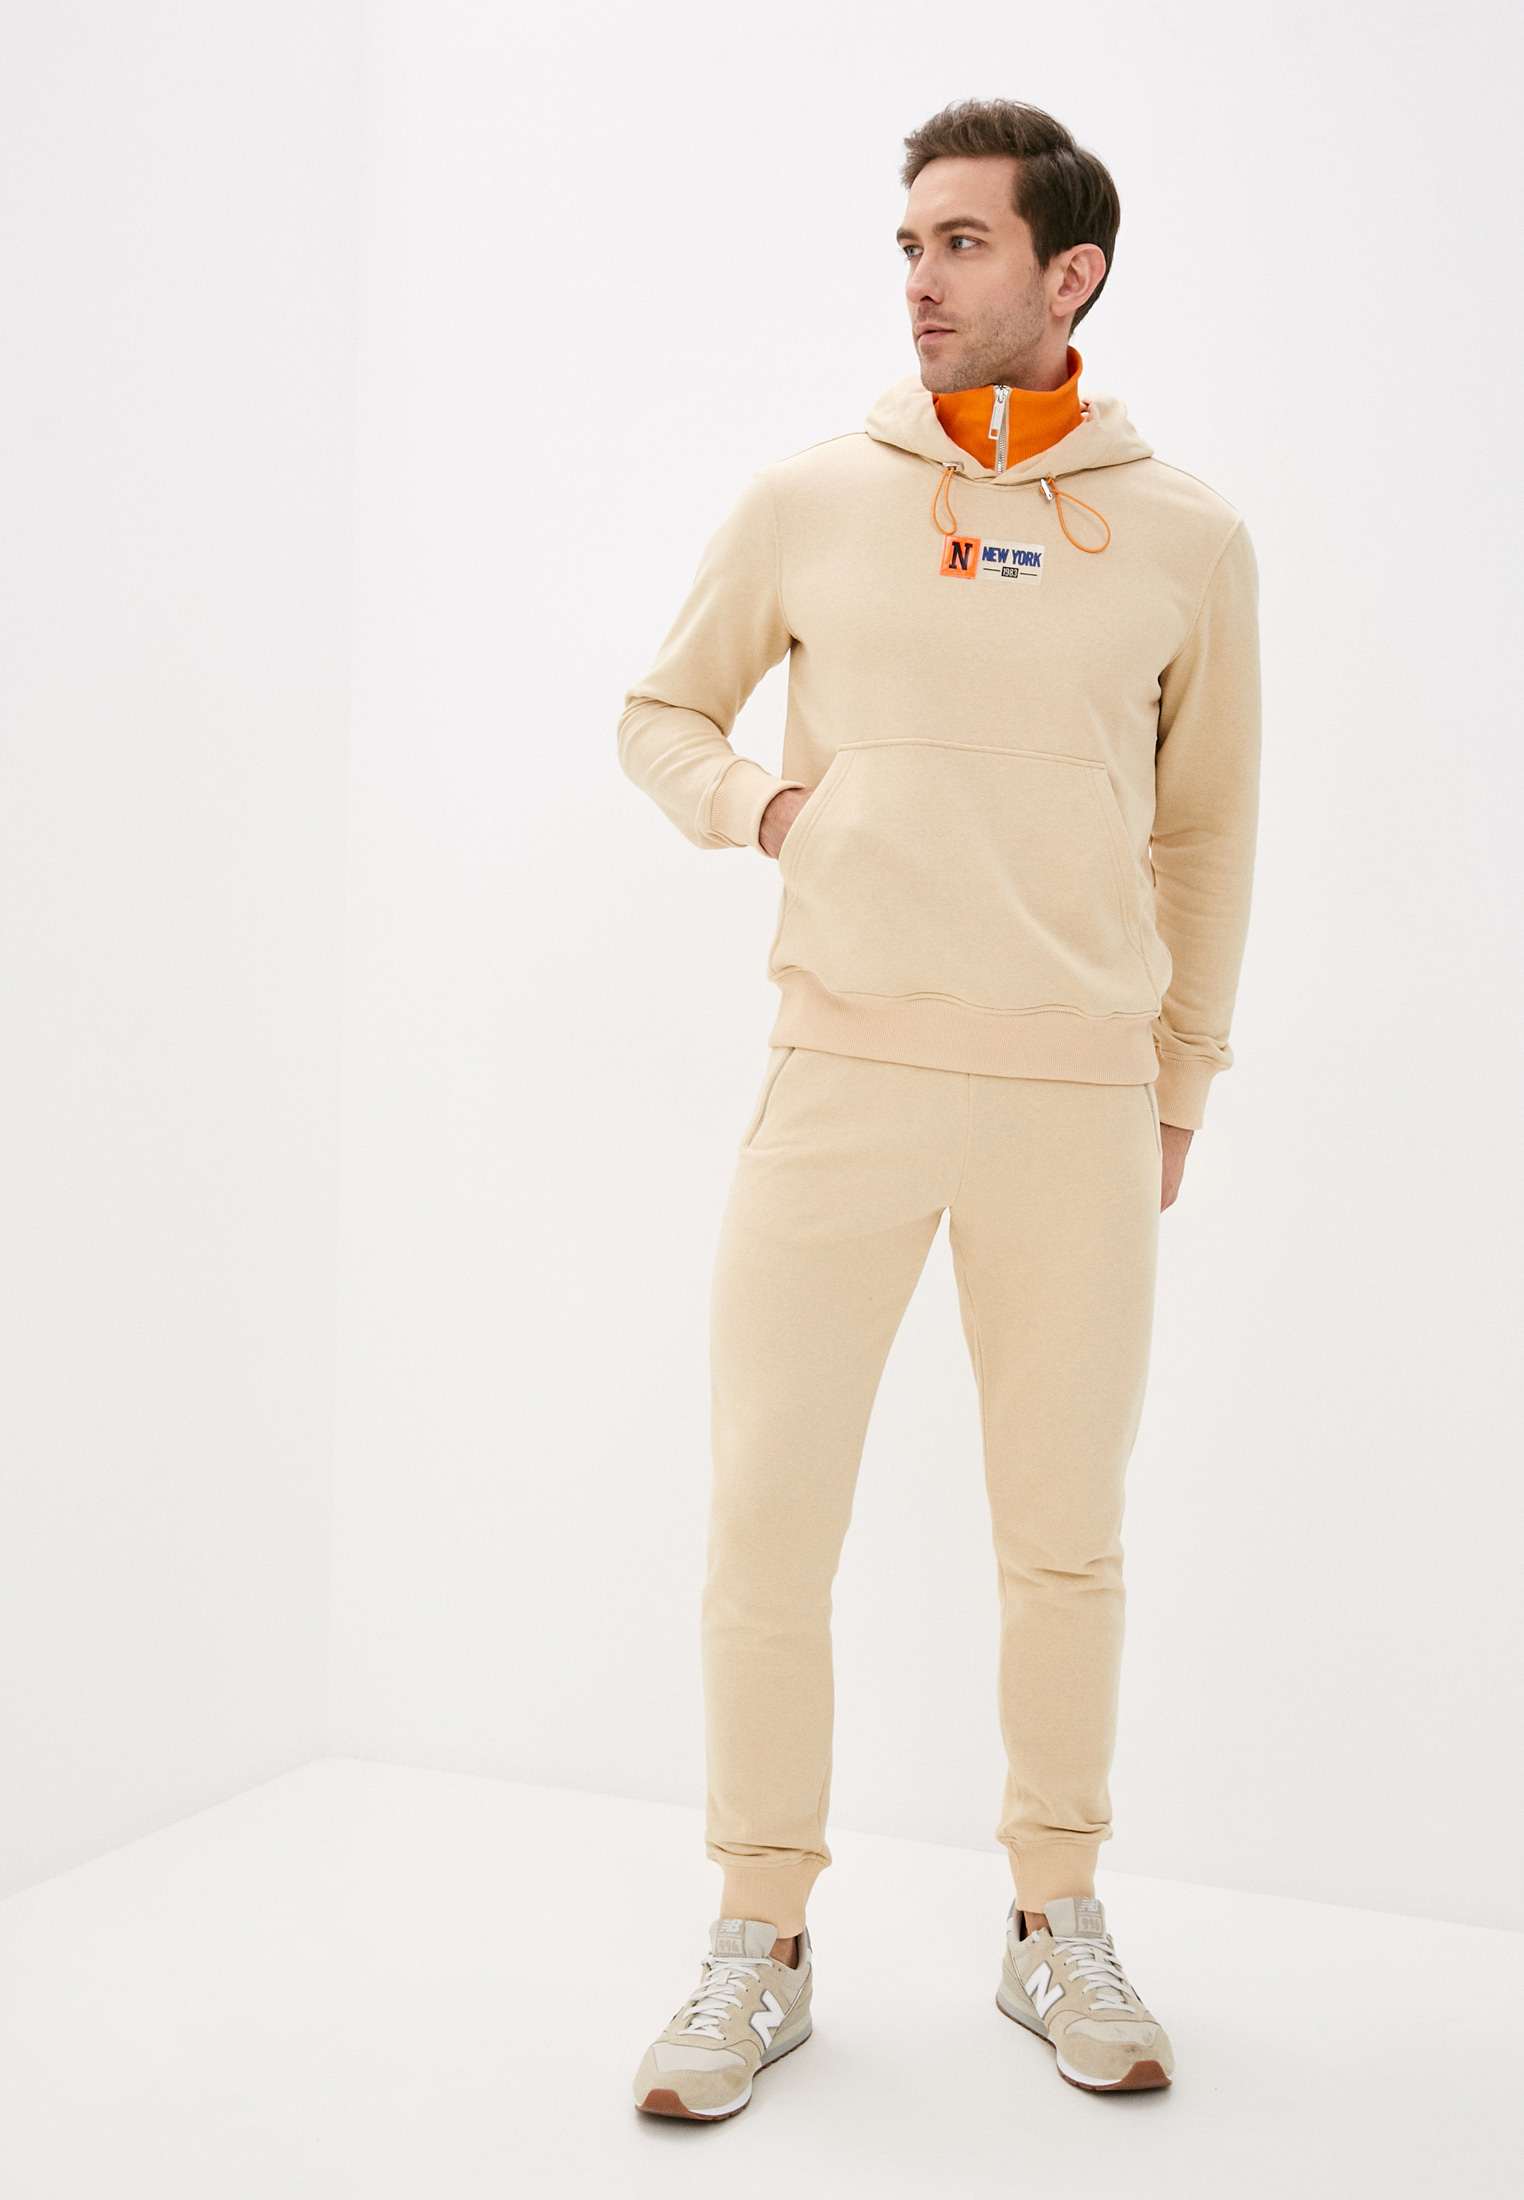 Спортивный костюм Sitlly 21802